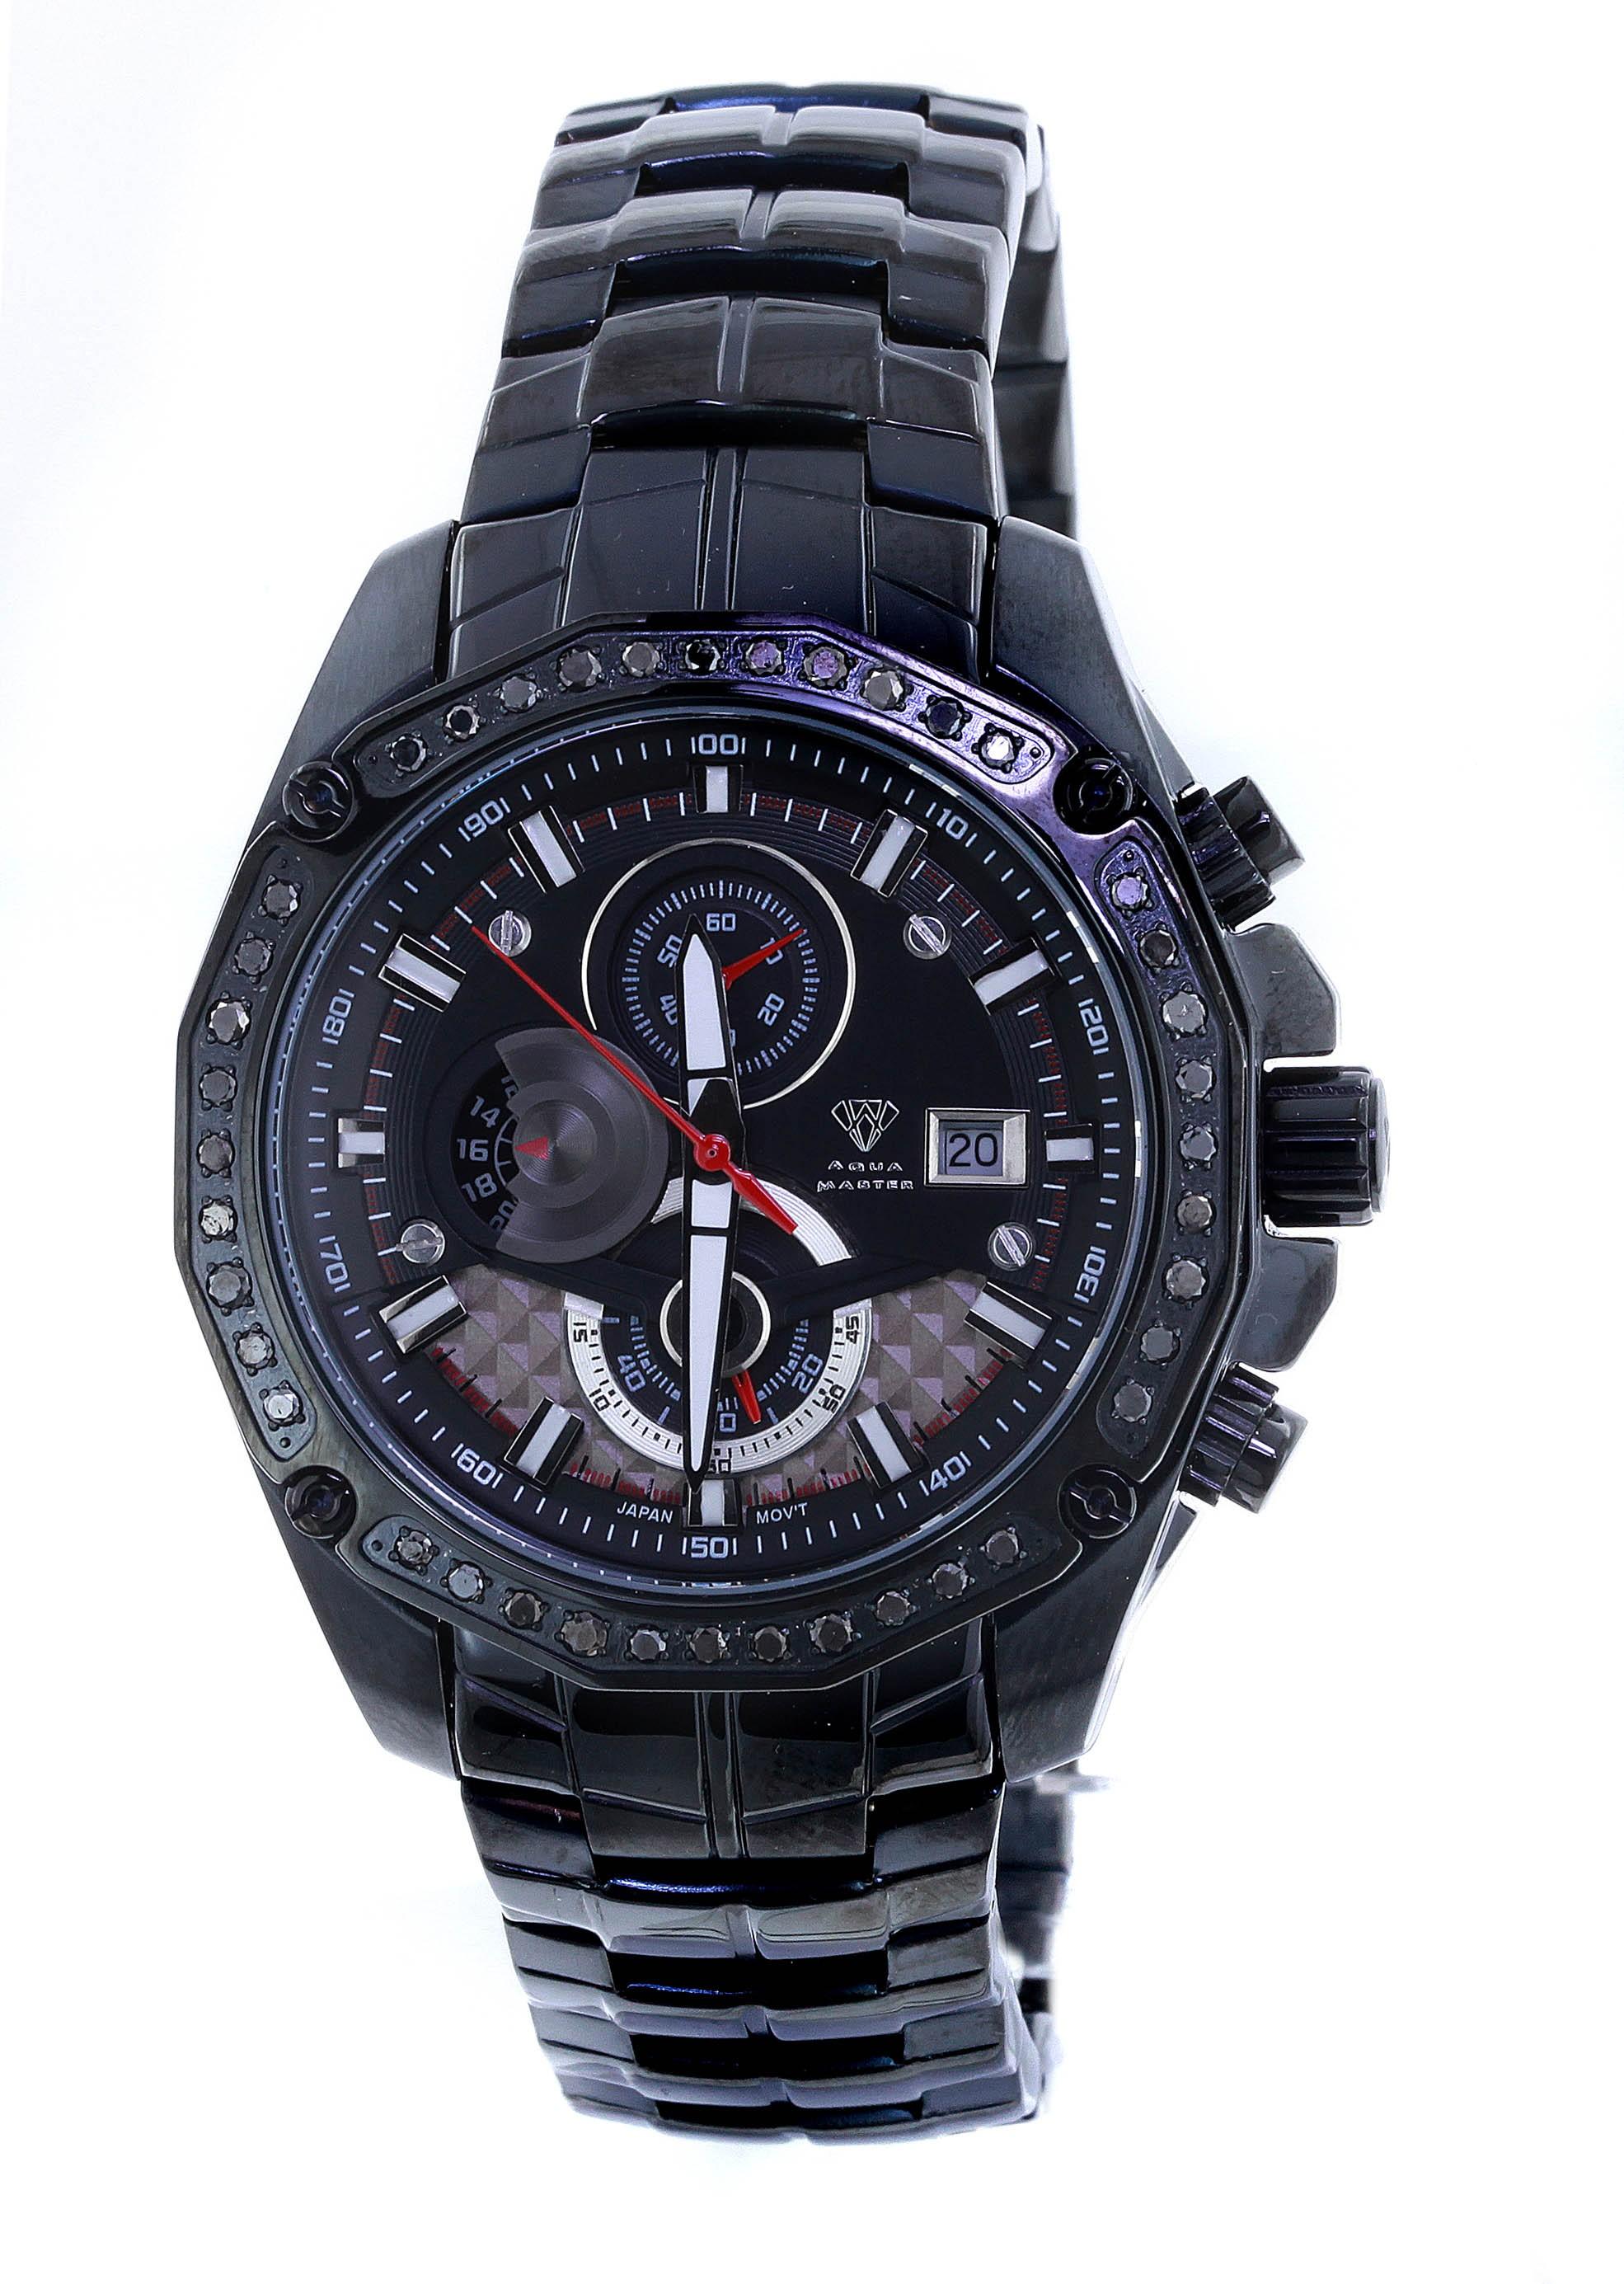 Aqua master watch ltd special crono watch for Aqua marine watches